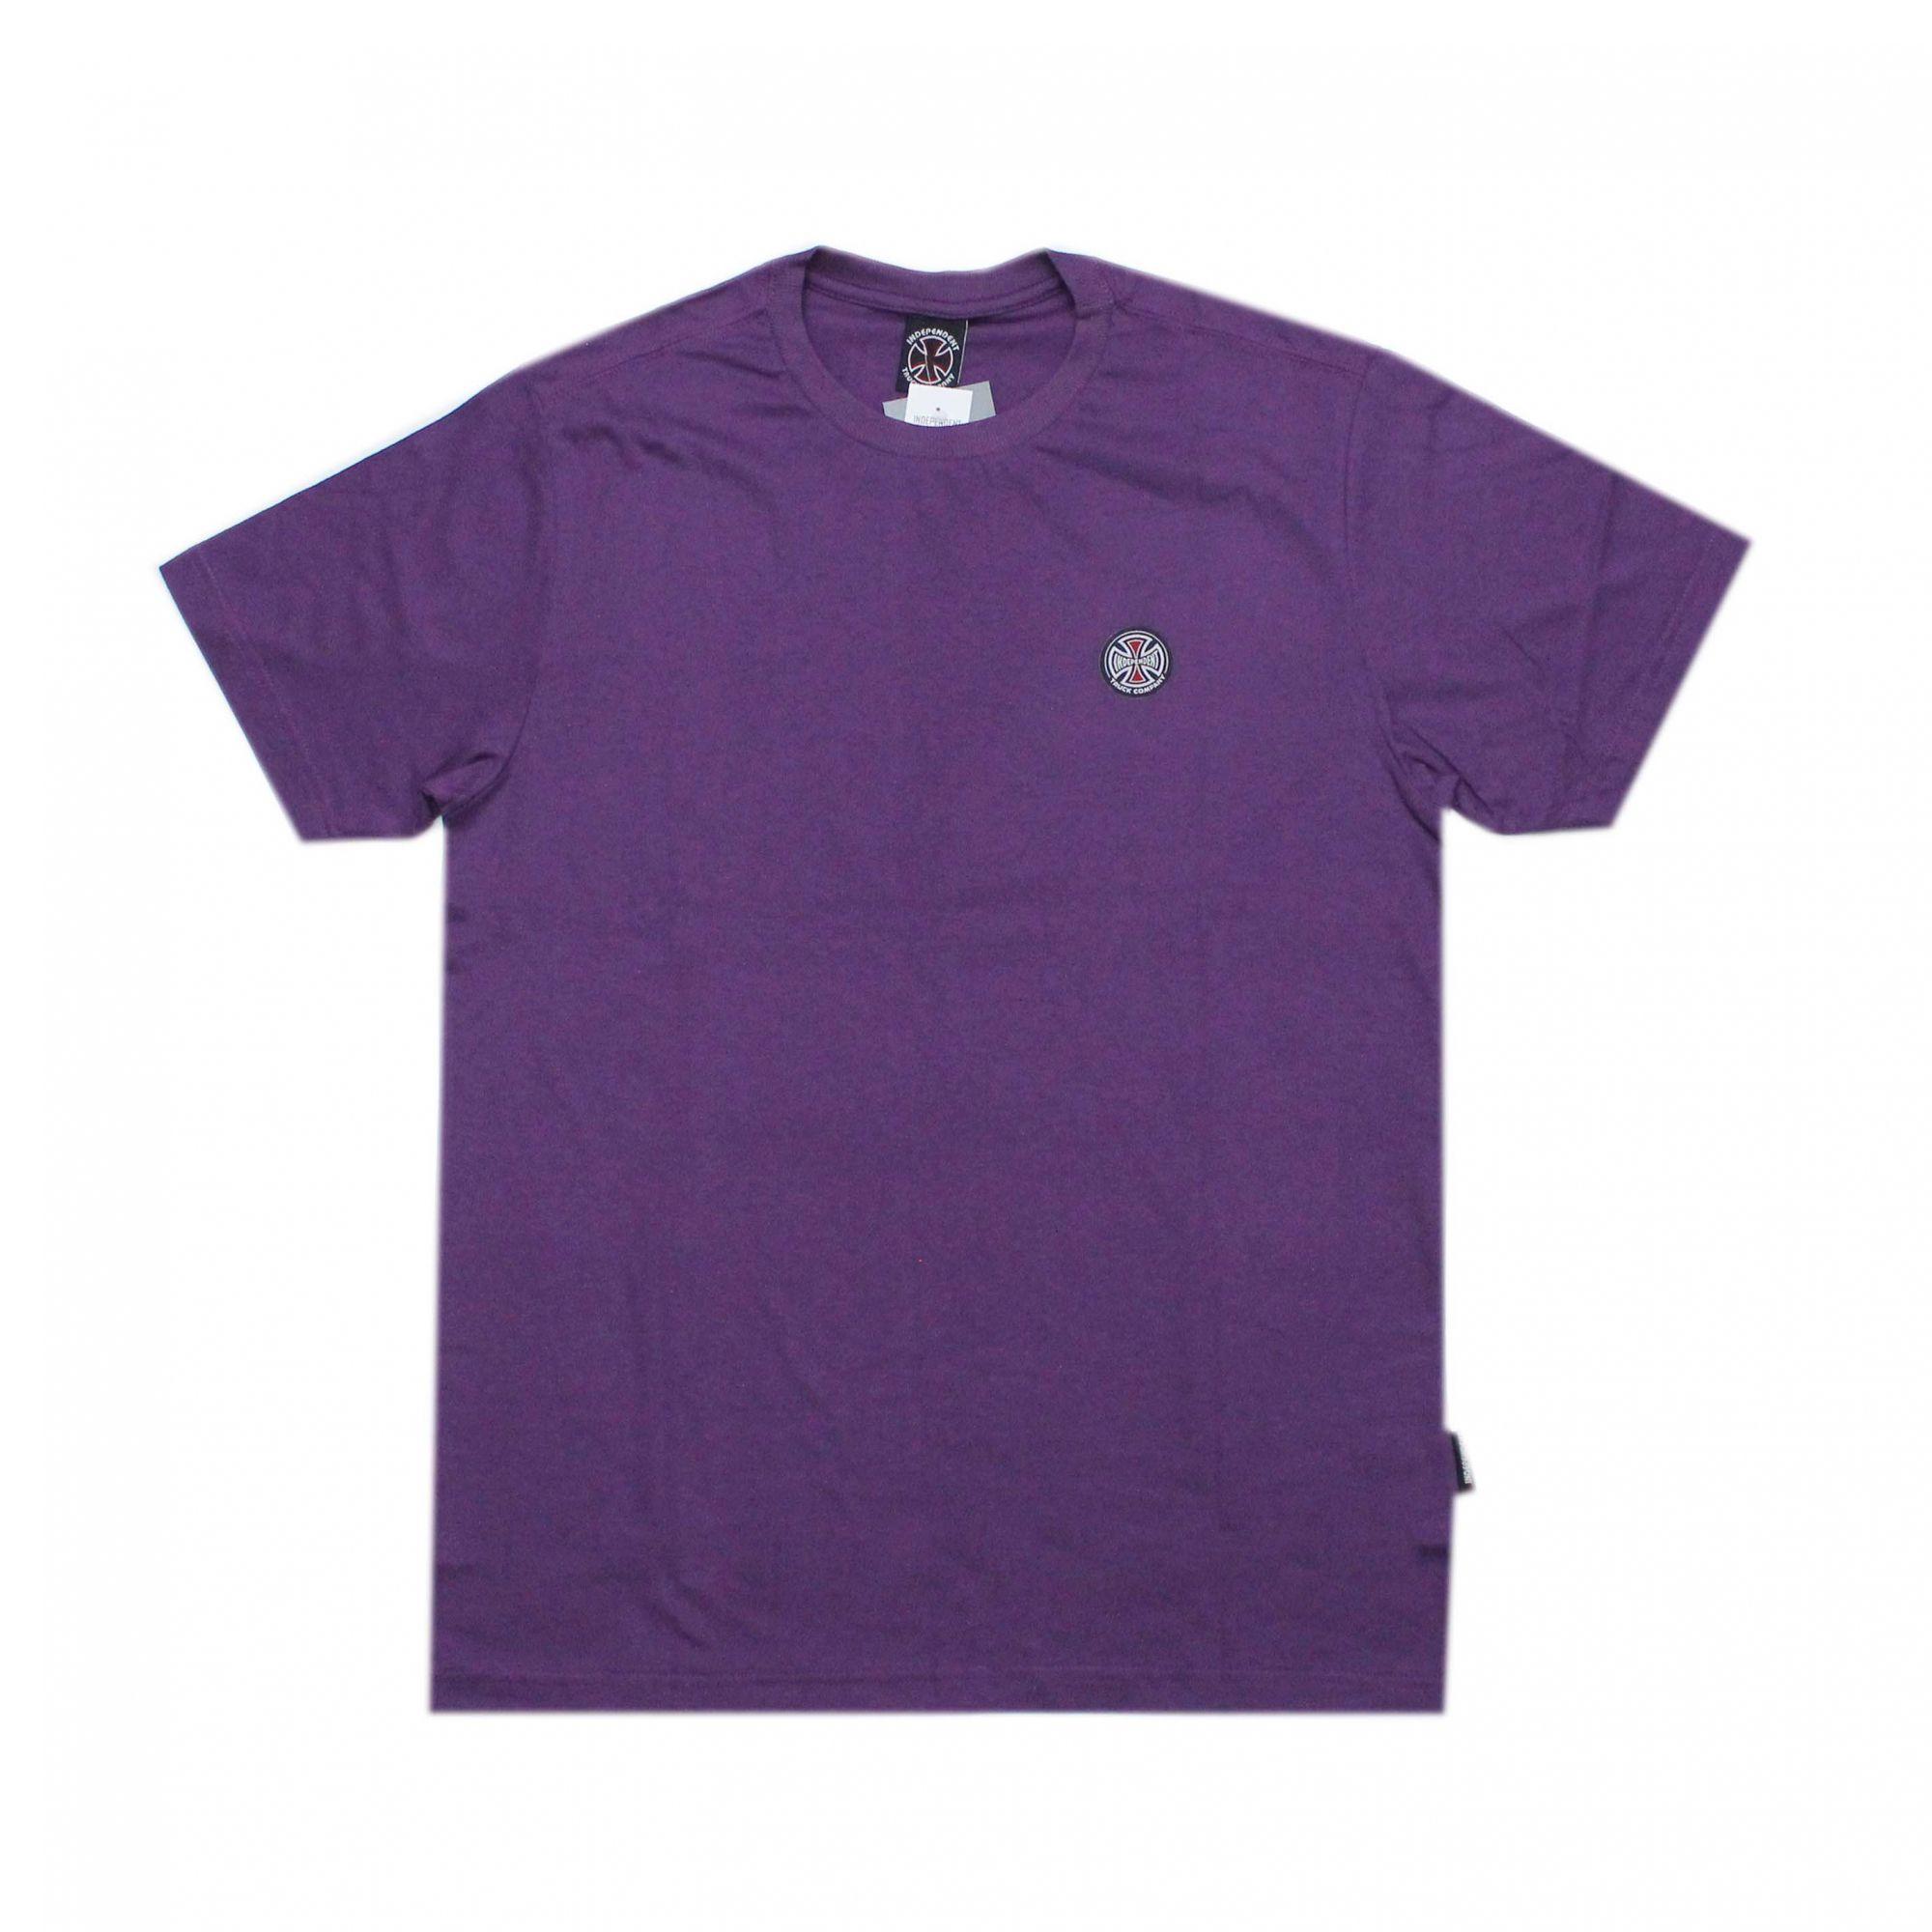 Camiseta Independent Truck Co 3 Colors F/C - Roxo